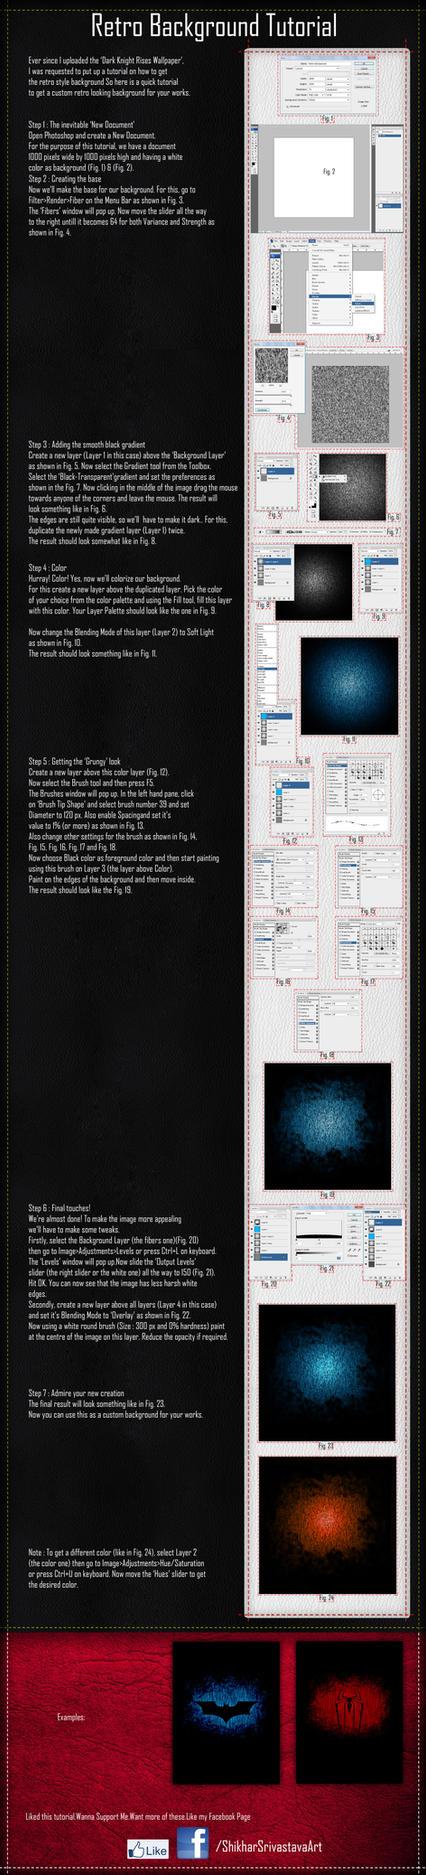 Retro Background Tutorial - Step by Step by ShikharSrivastava